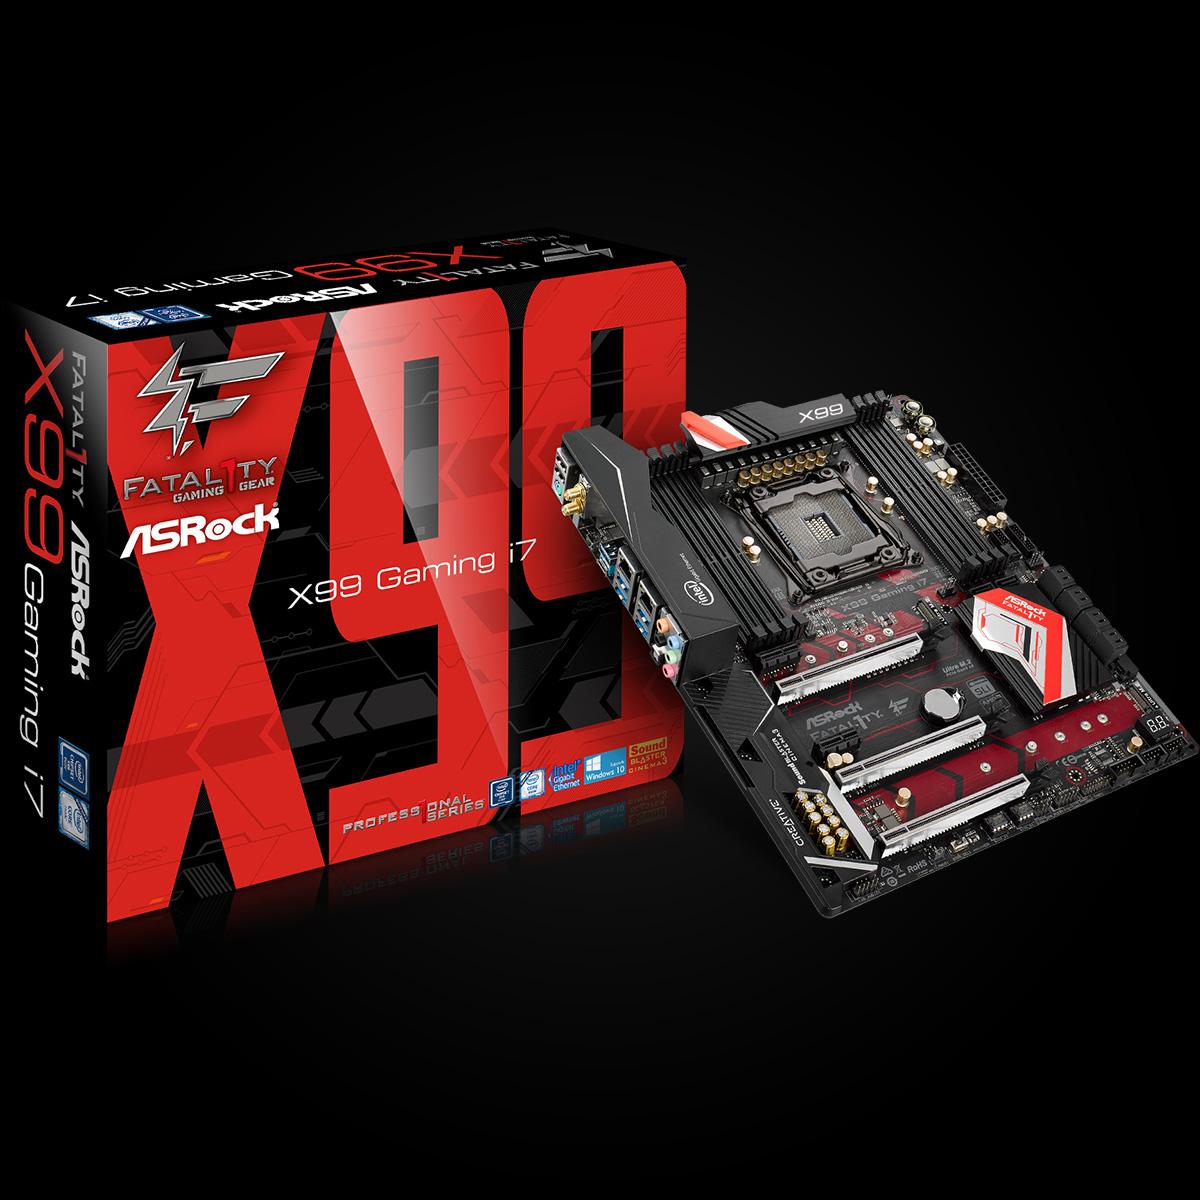 Main Fatal1ty X99 Professional Gaming i7, Socket 2011